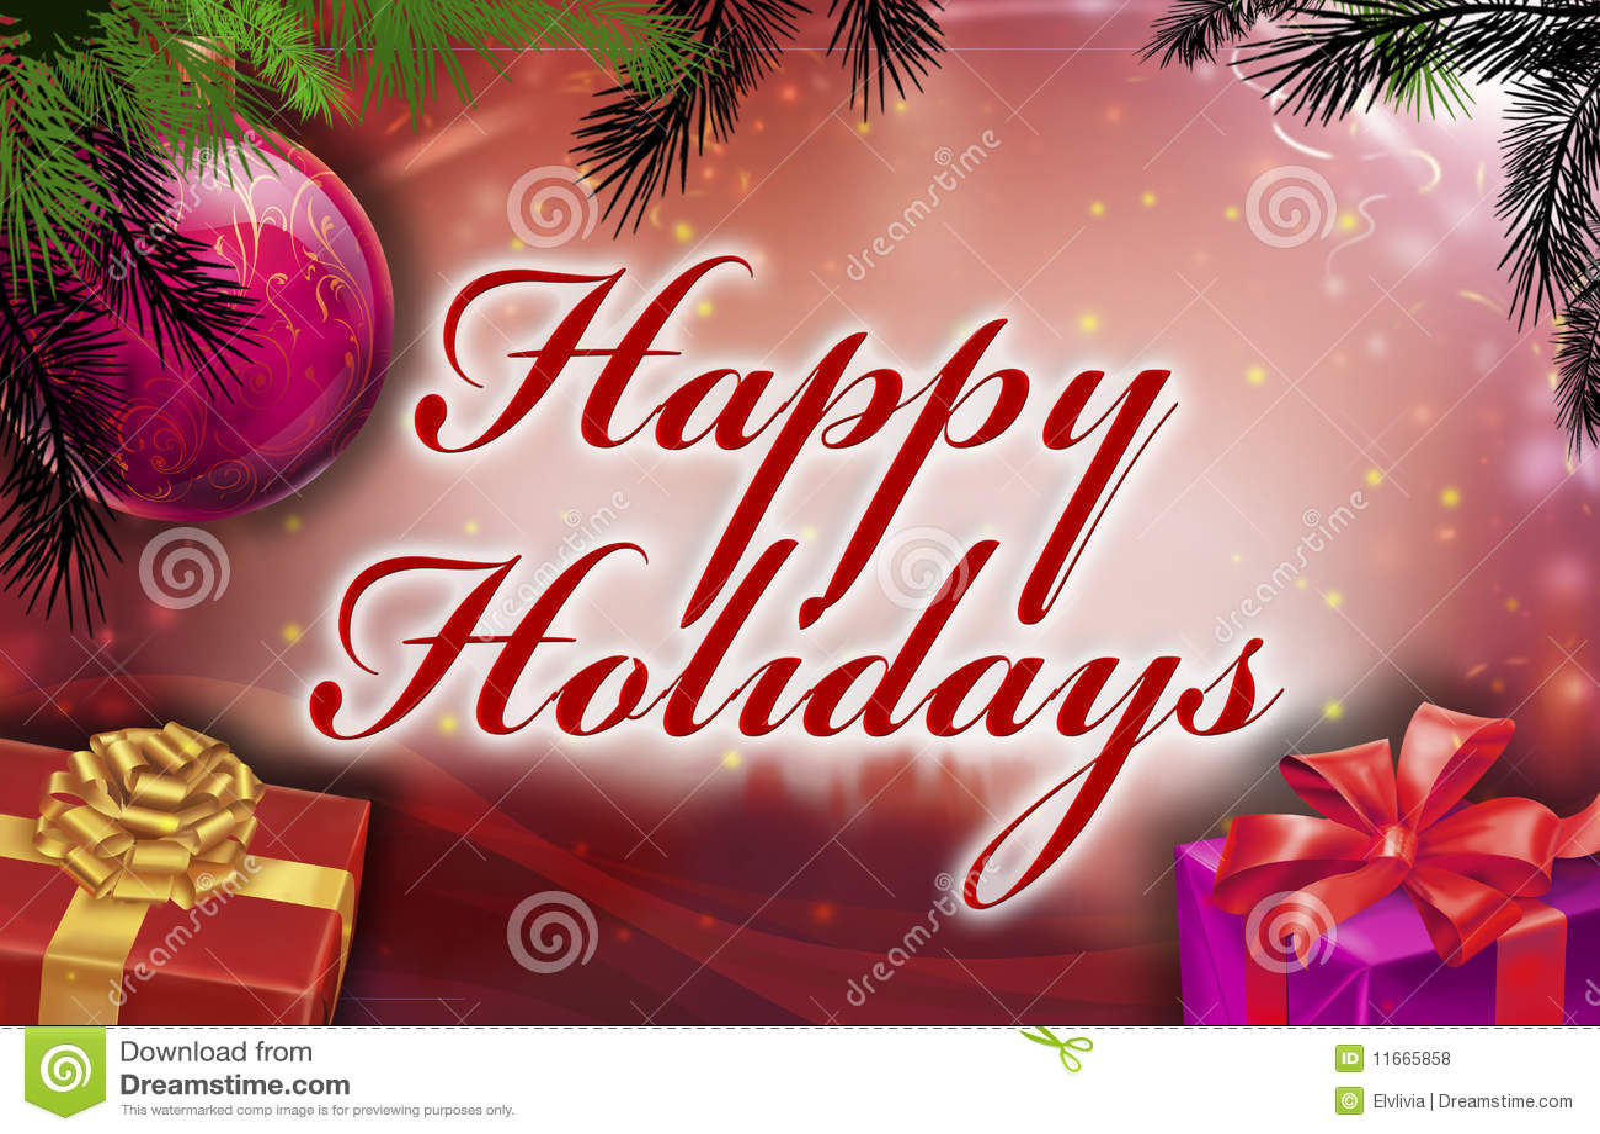 Frohe Feiertage Wünsche